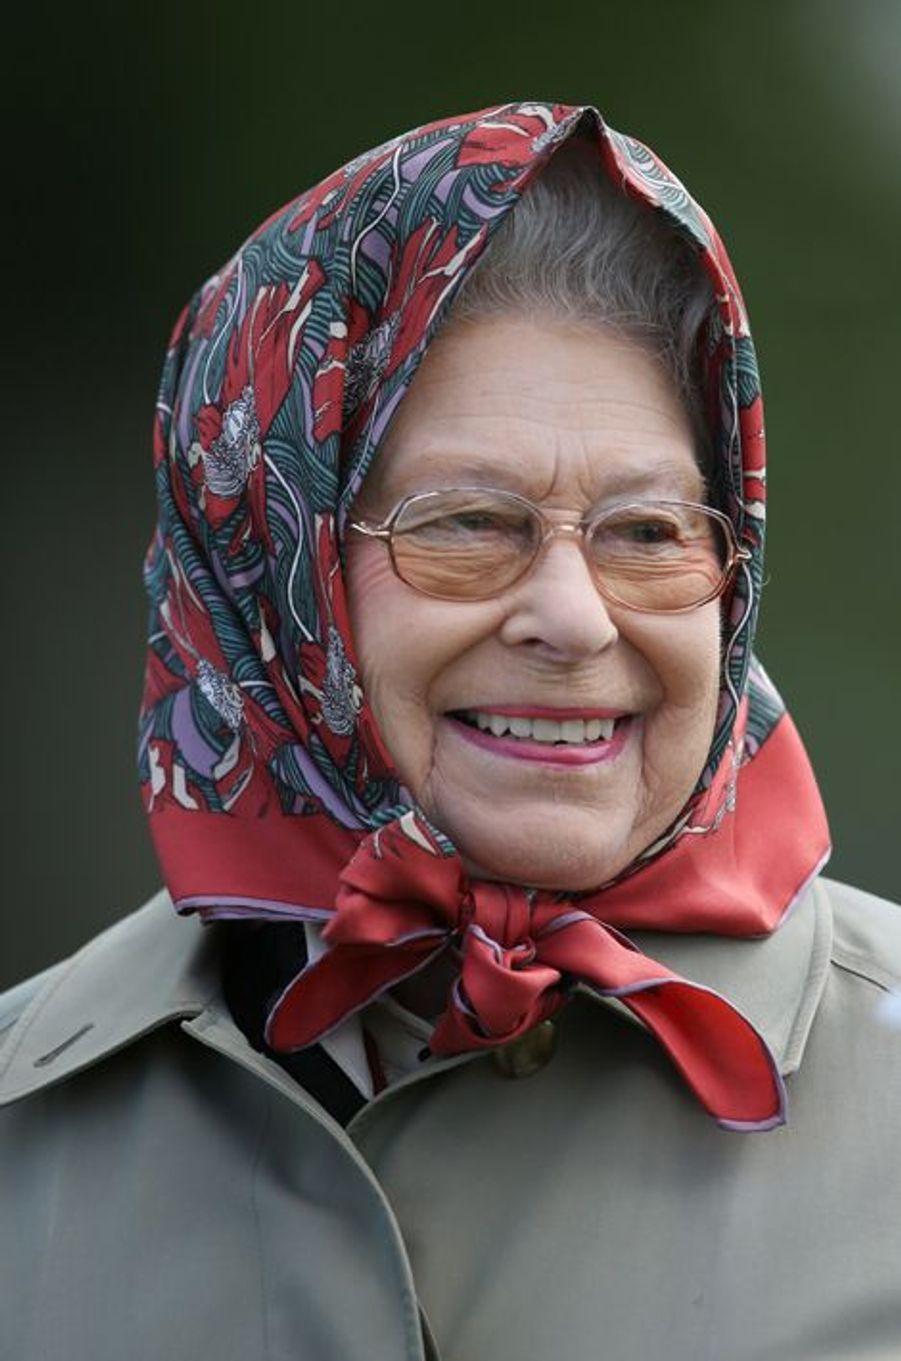 La reine Elizabeth II au Royal Windsor Horse Show, le 15 mai 2015